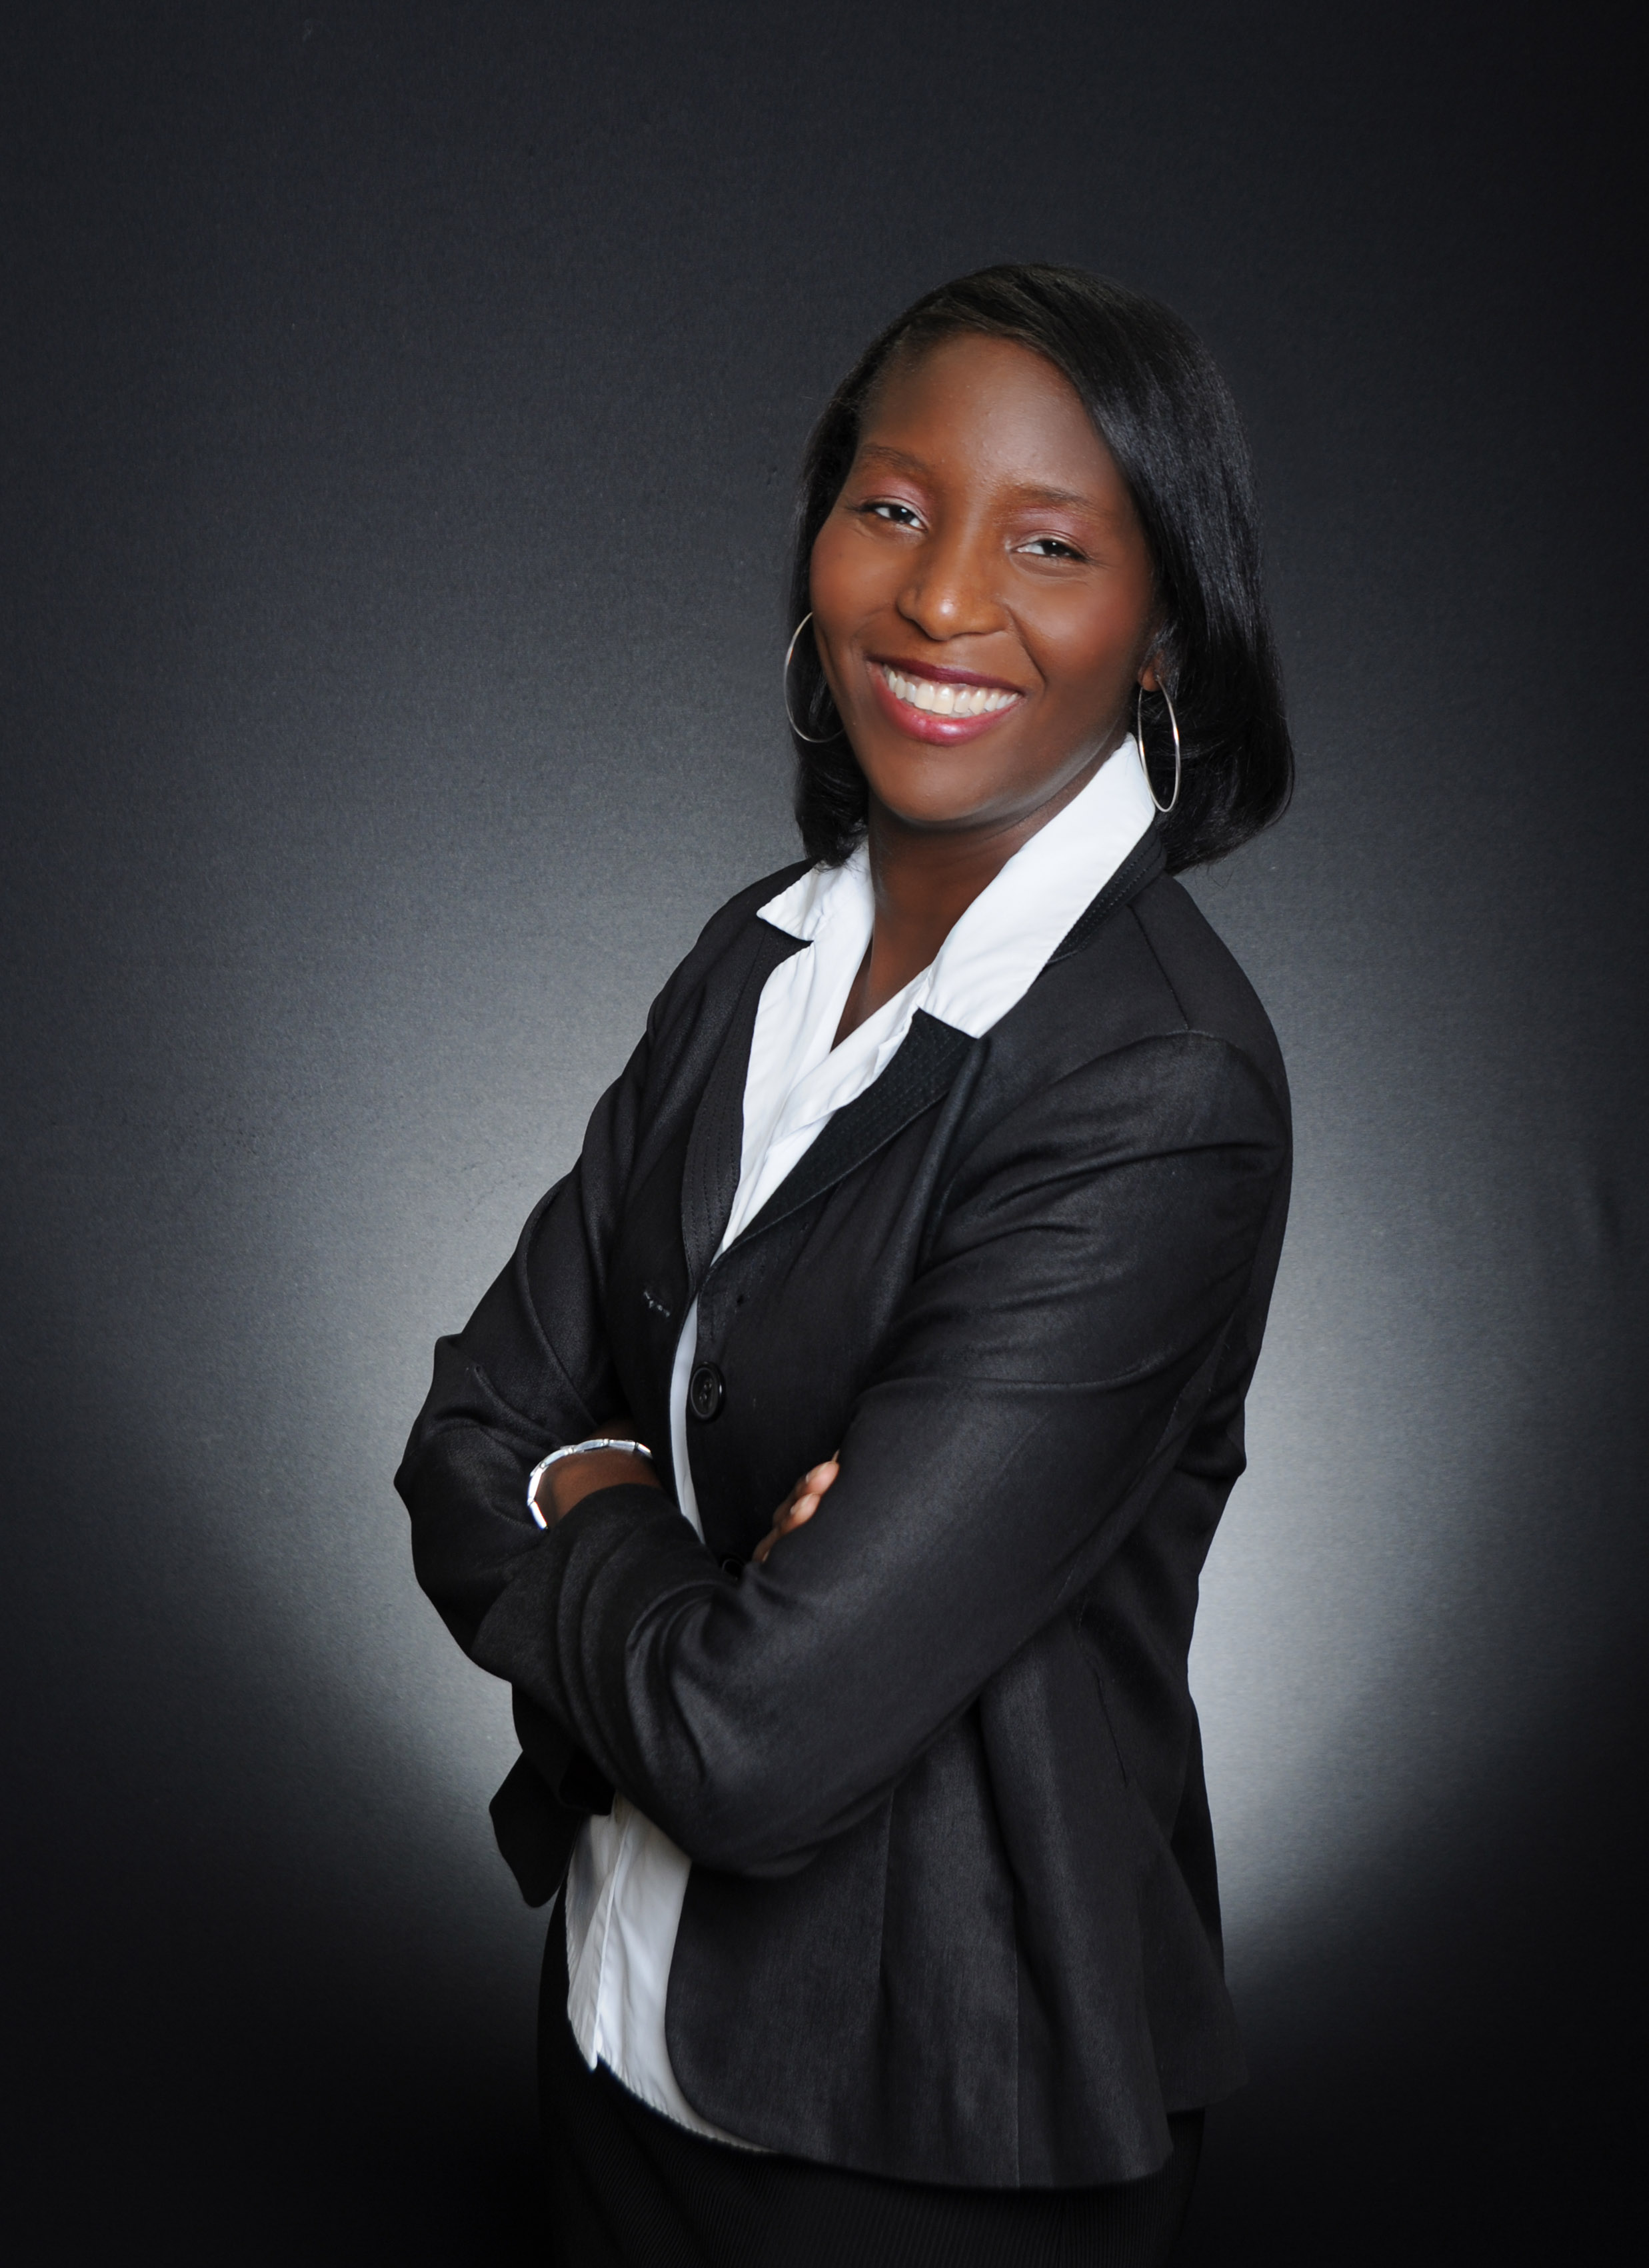 Stacey Gordon MBA